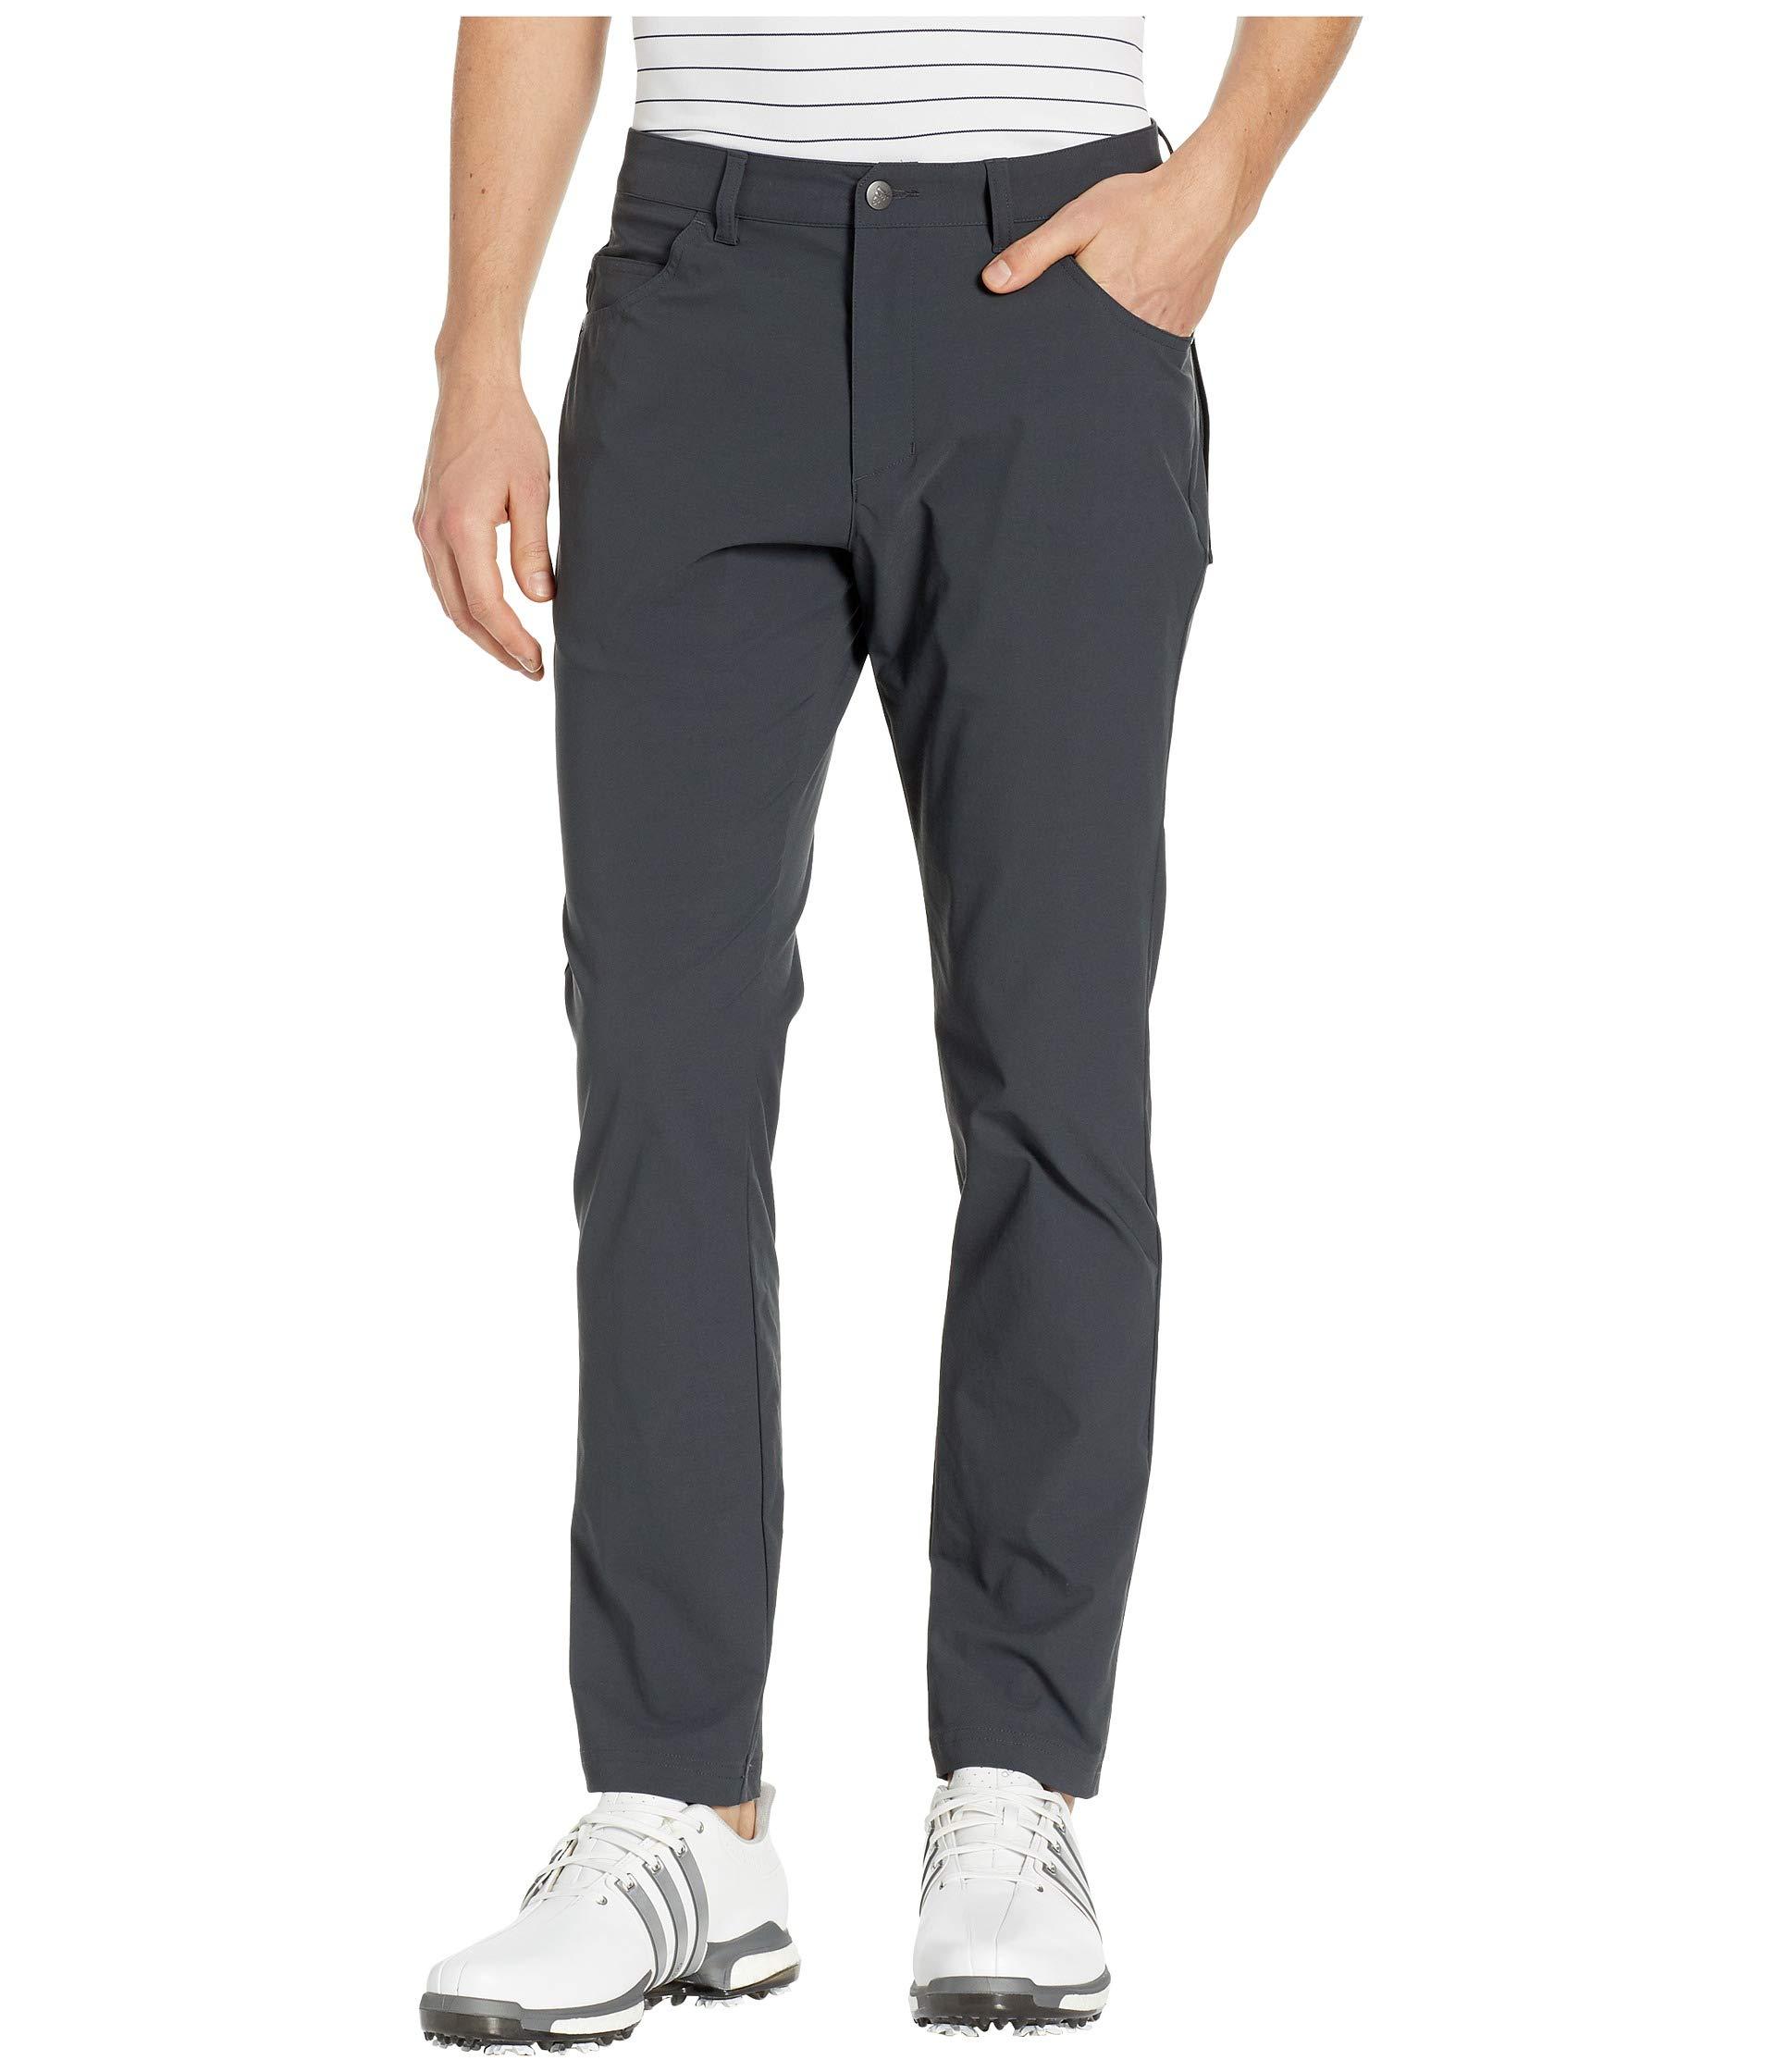 adidas Golf Adicross Beyond 18 Slim 5-Pocket Pant, Carbon, 3030